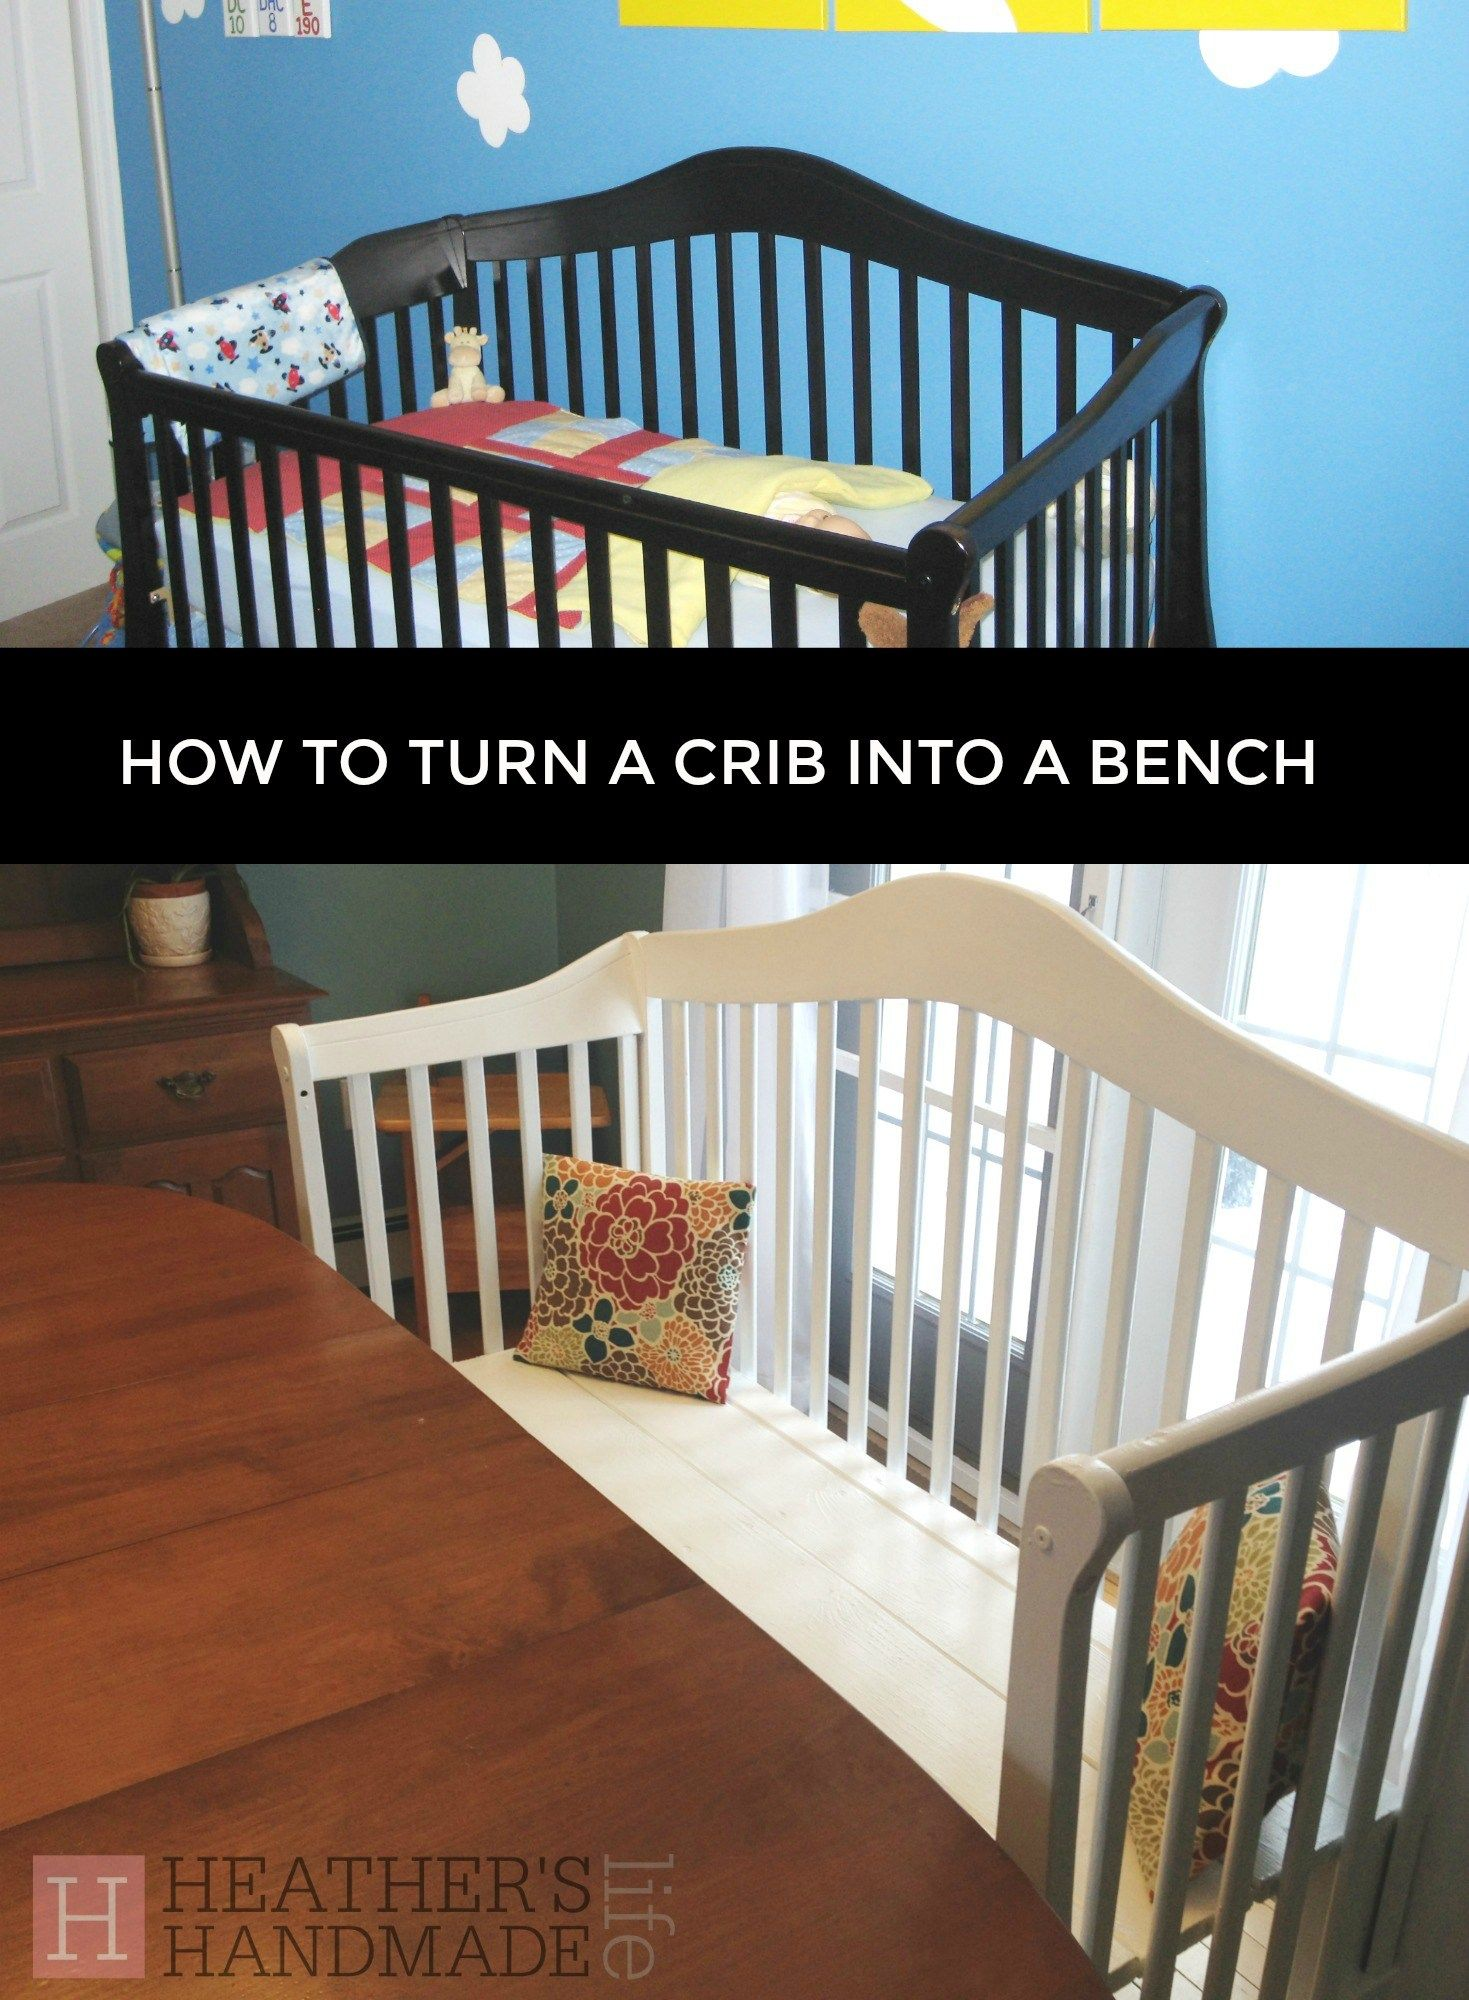 Turn Your Crib Into A Bench {Heathers Handmade